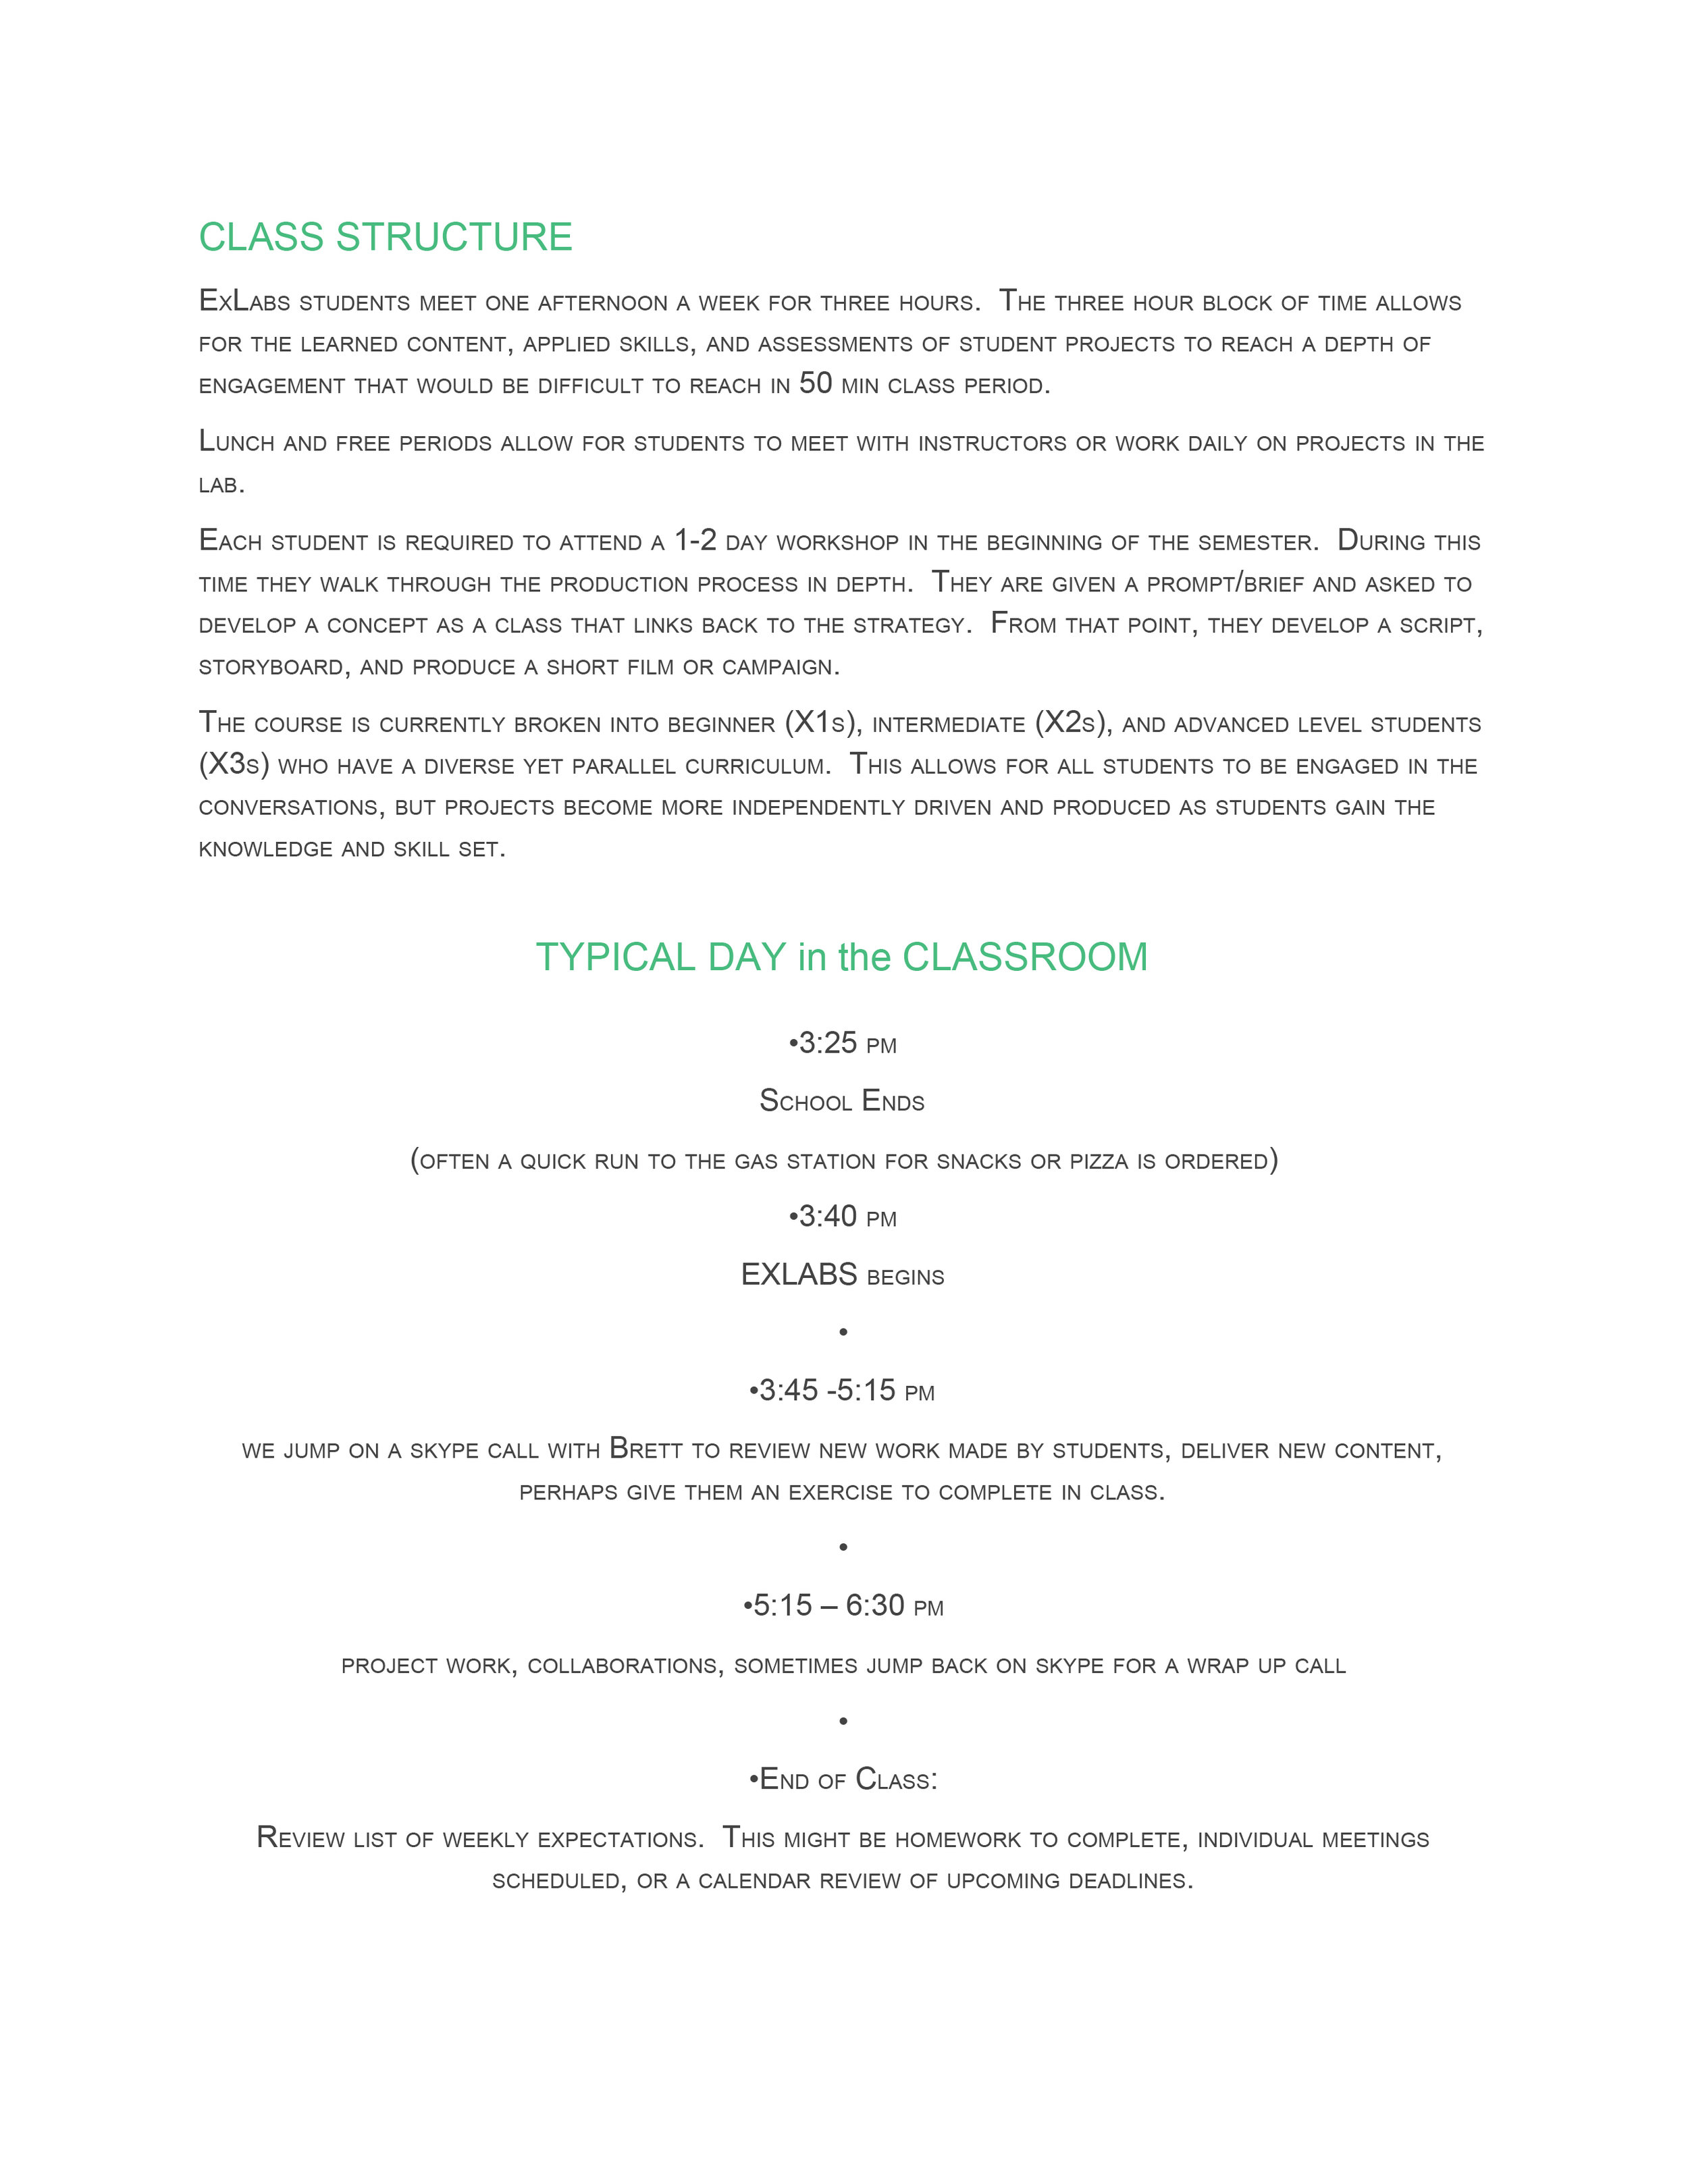 Educators Page - ExLabs-1.jpg